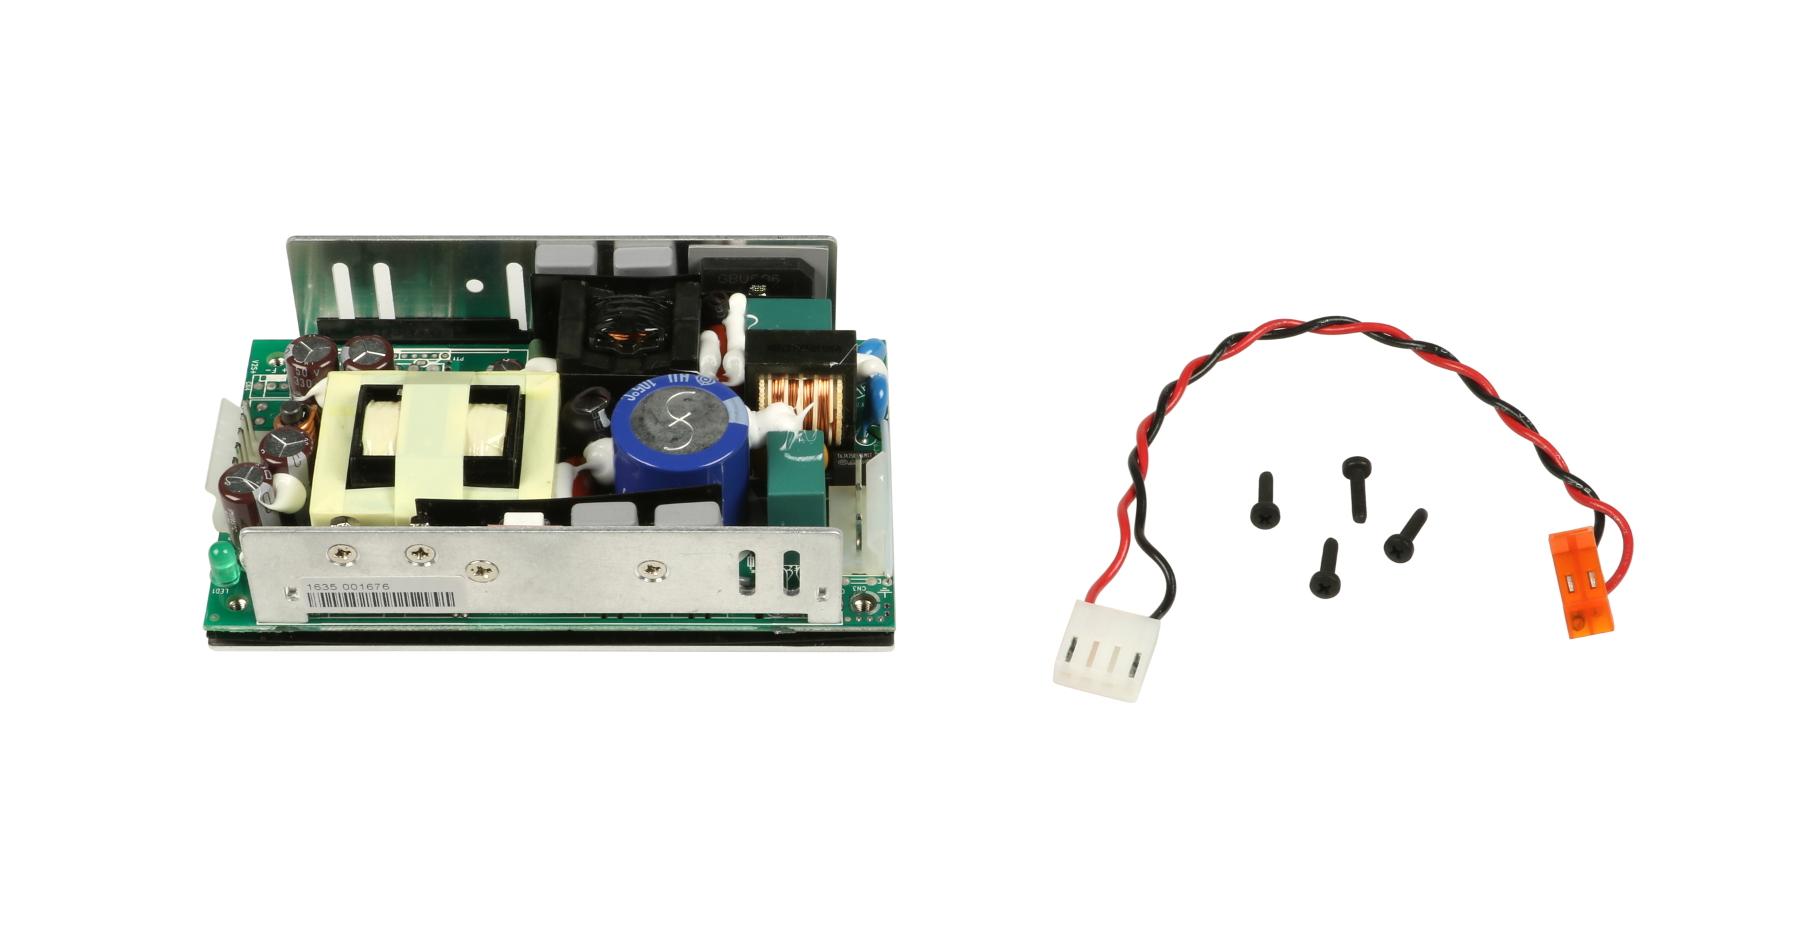 BEA-7500U1 Power Supply PCB